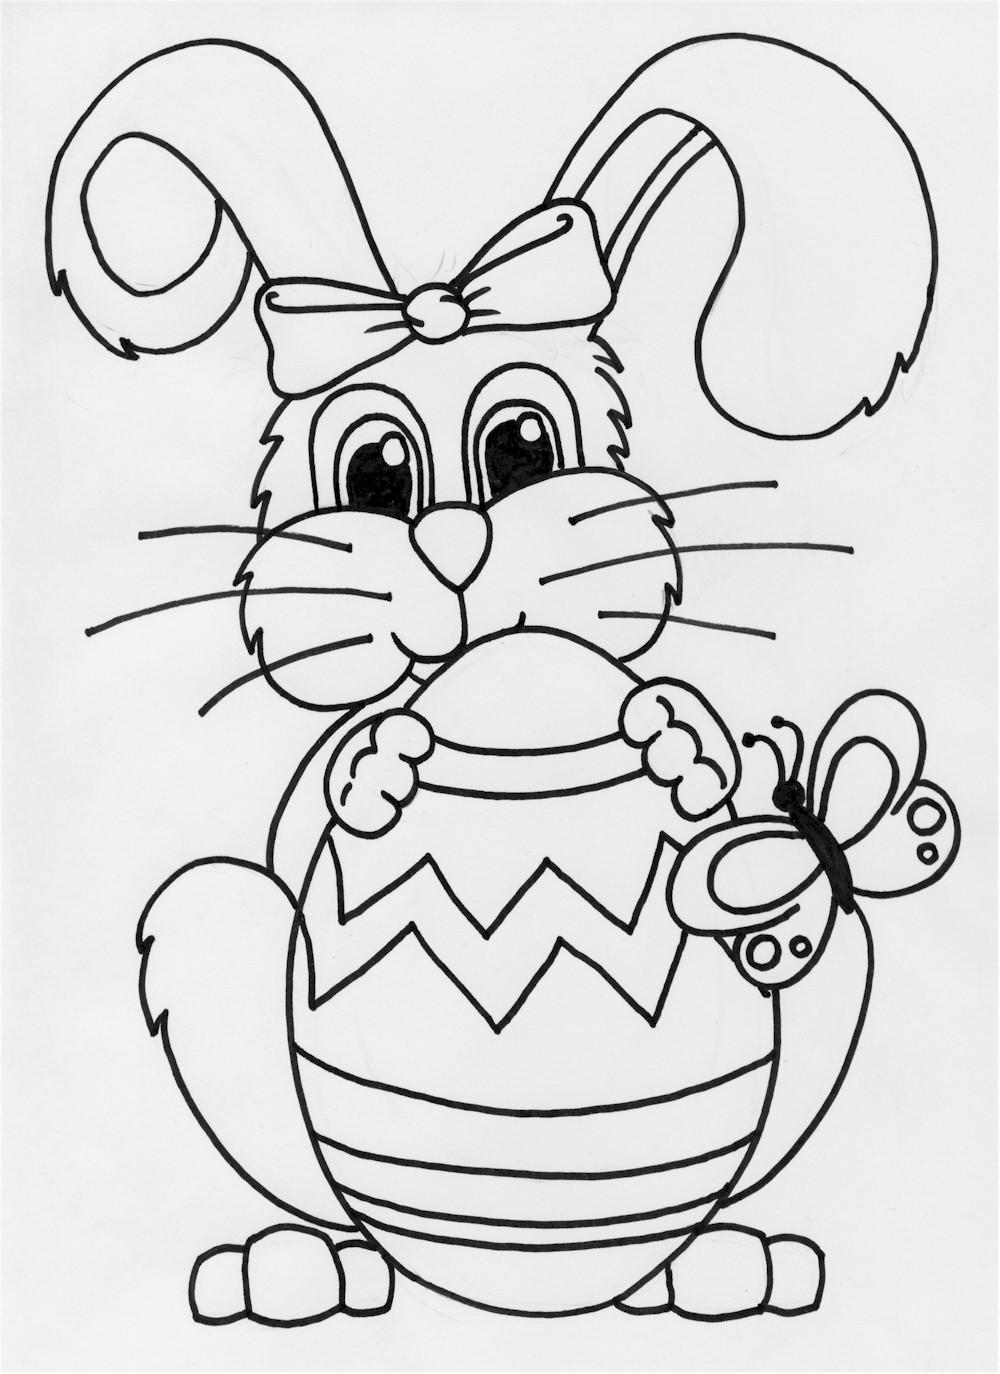 1000x1374 Adult Bunny Stencils Bunny Pumpkin Stencils. Bunny Rabbit Stencils